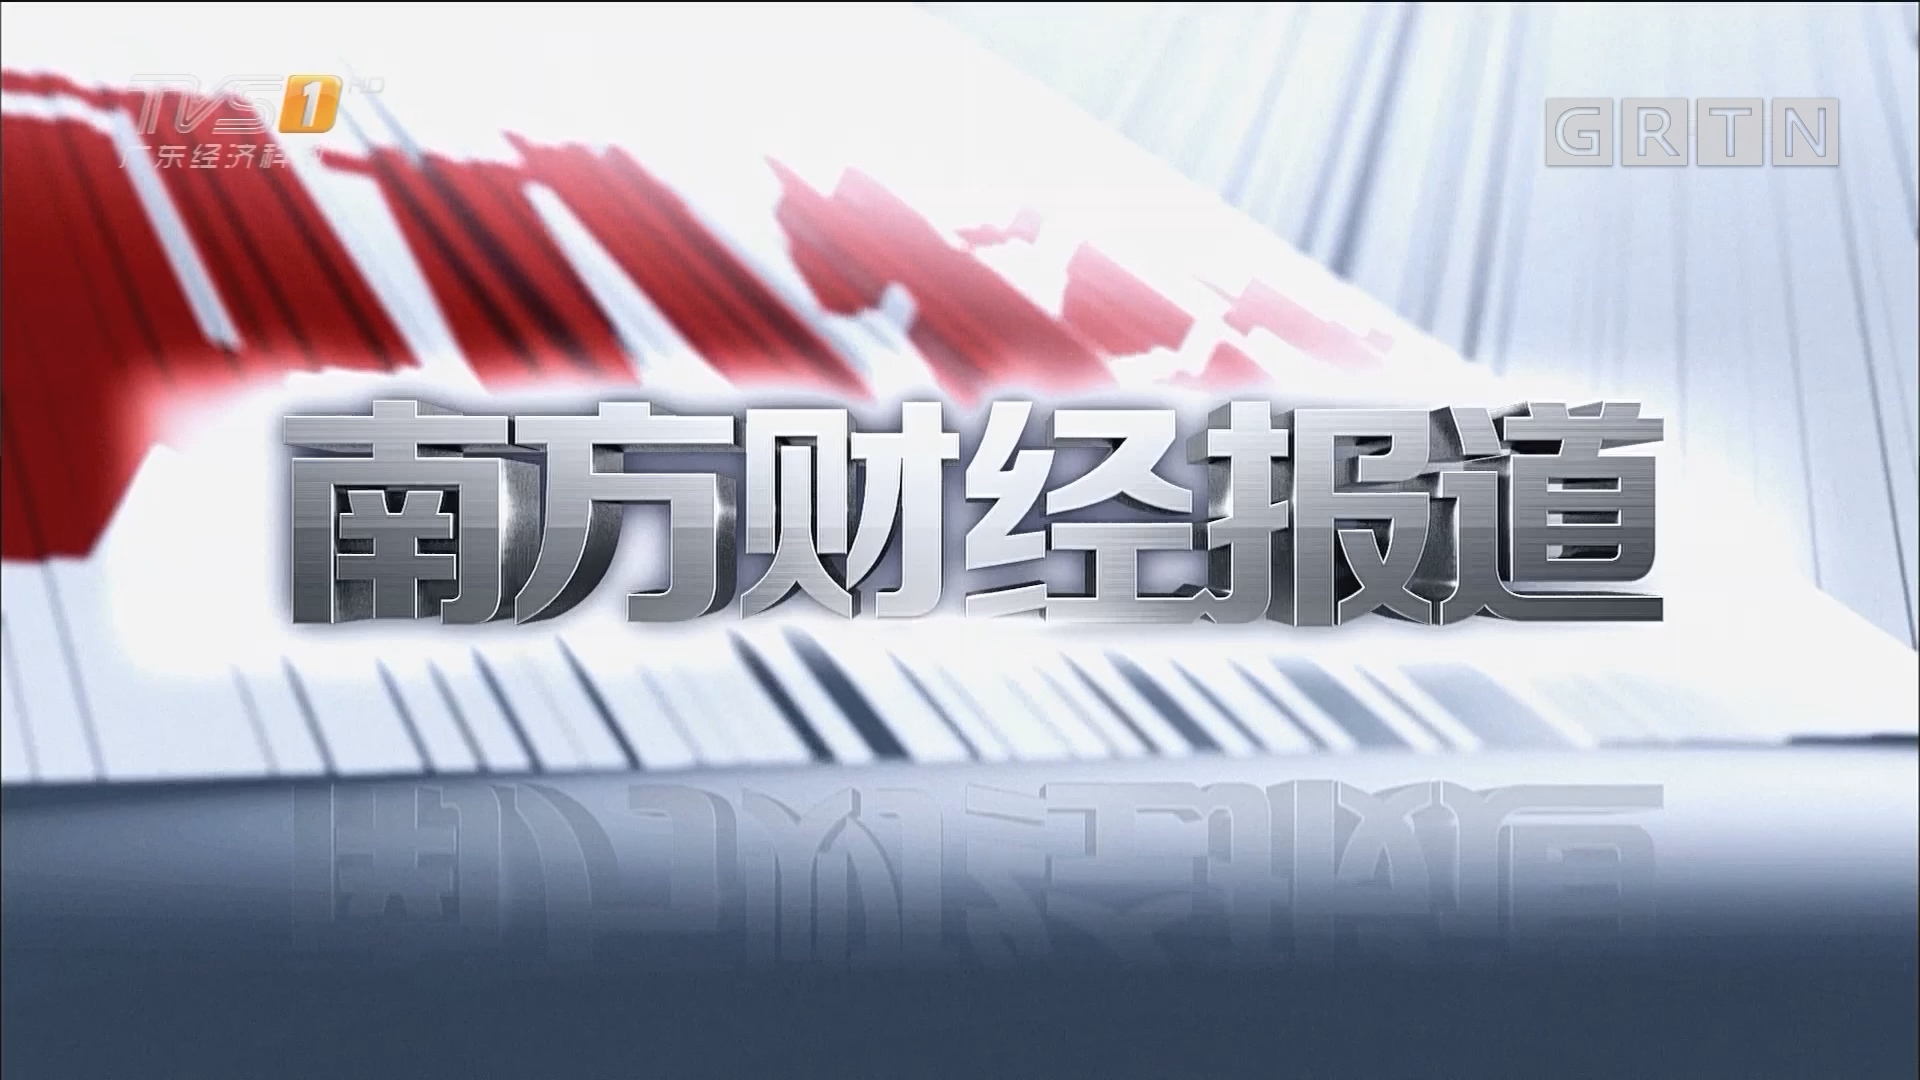 [HD][2018-01-23]南方财经报道:796名广东省十三届人大代表顺利选出